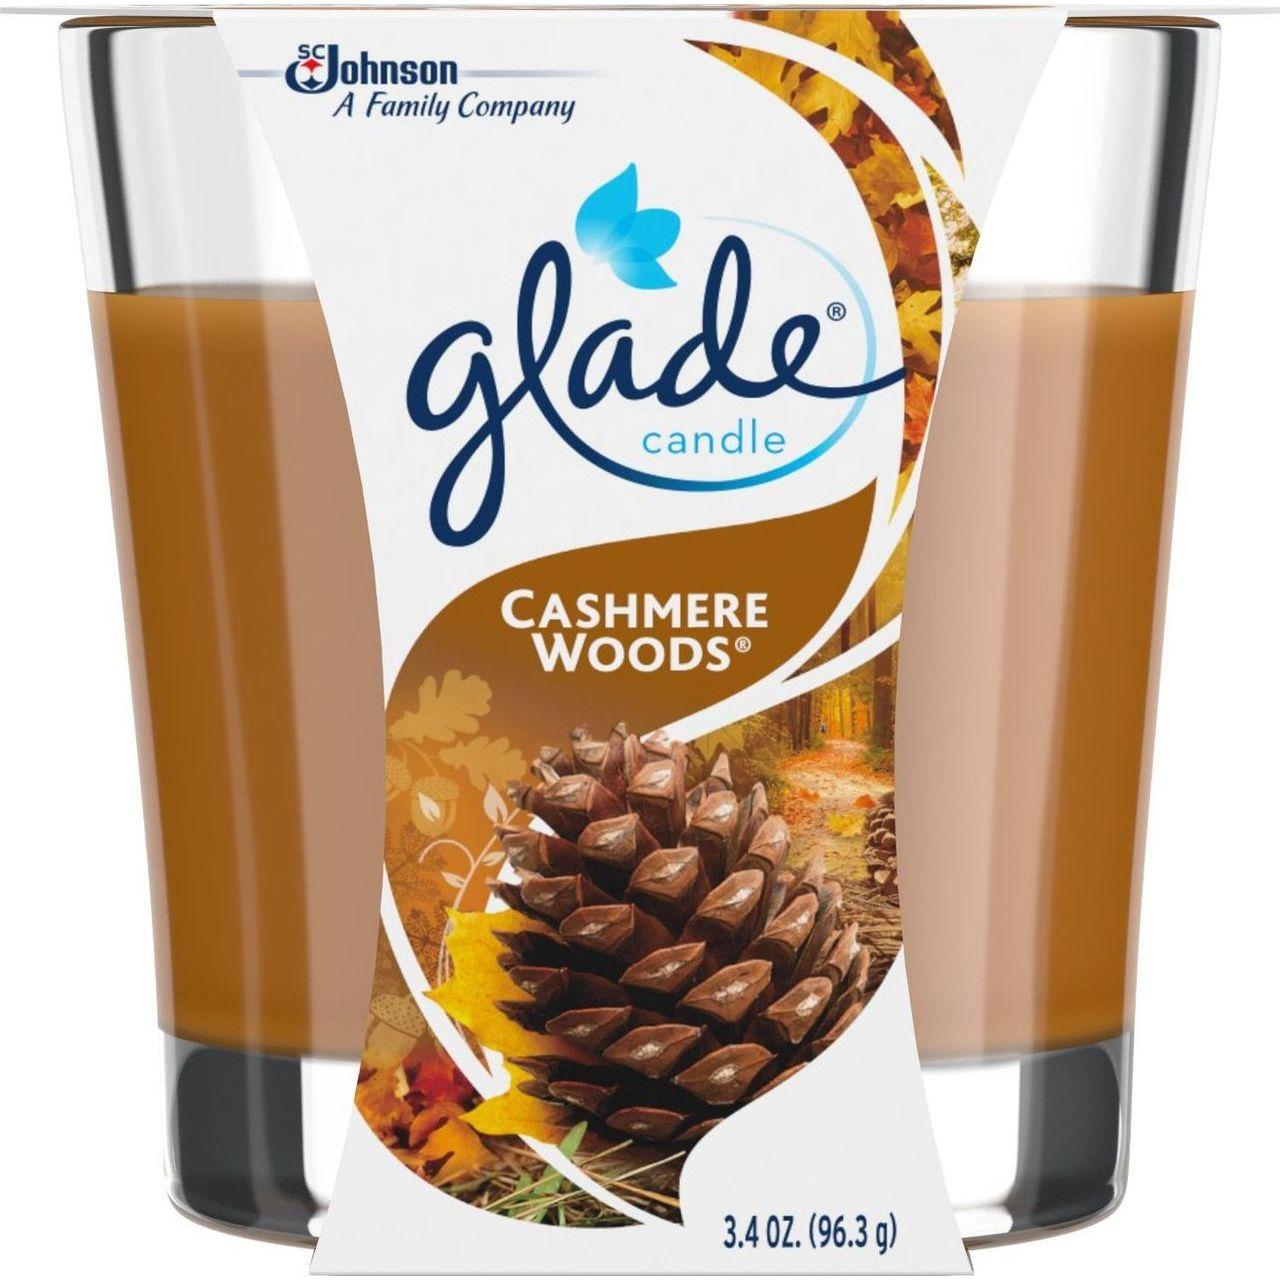 SC Johnson 3.8 oz Jar Cashmere Woods Candle Air Freshener